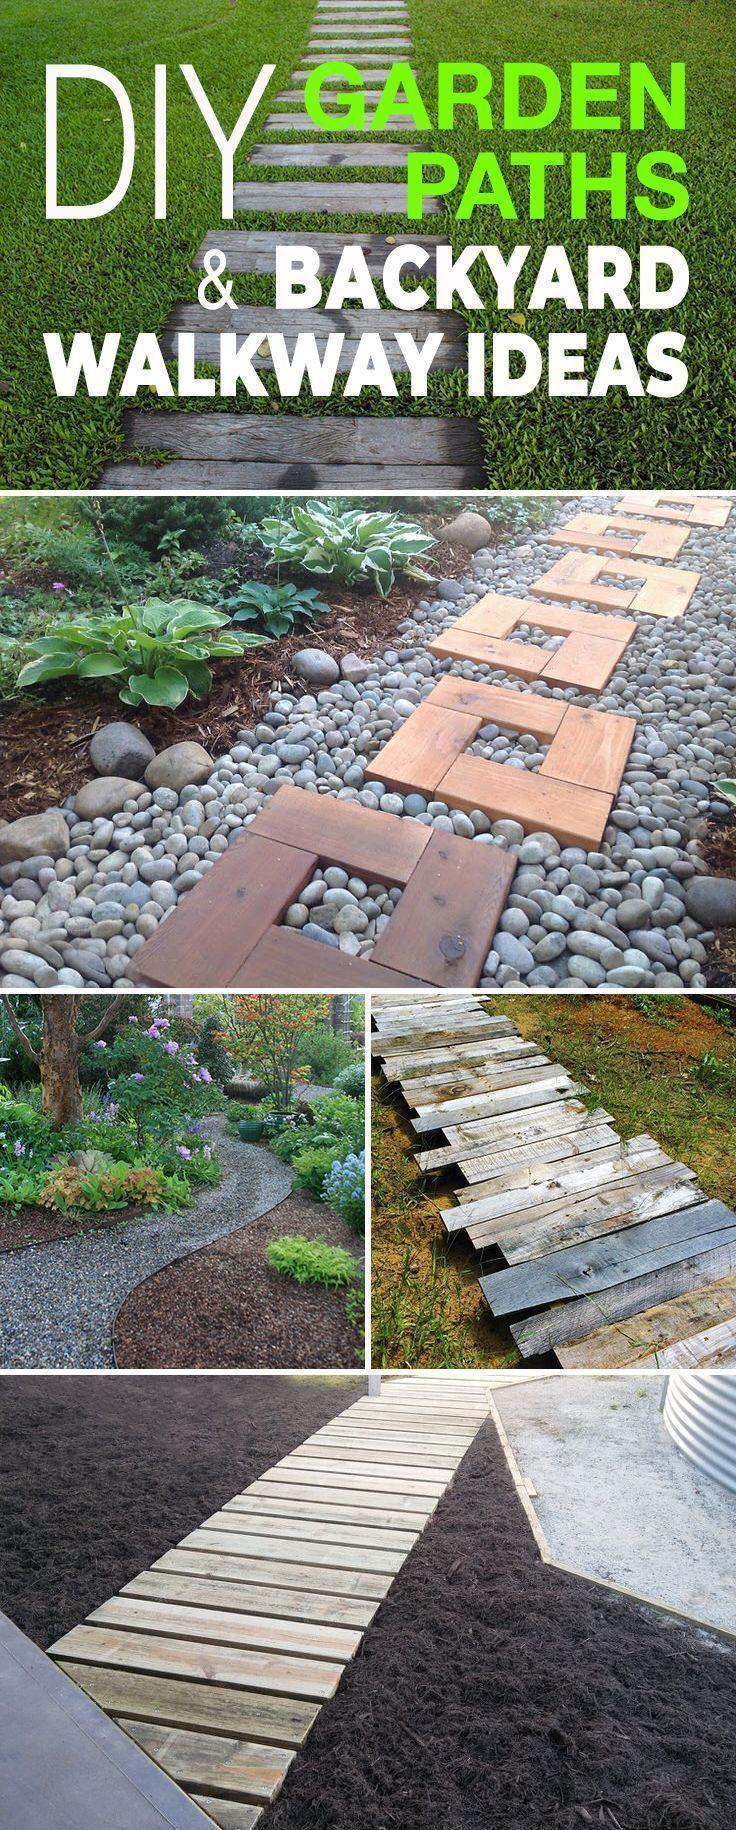 DIY Garden Paths And Backyard Walkway Ideas!